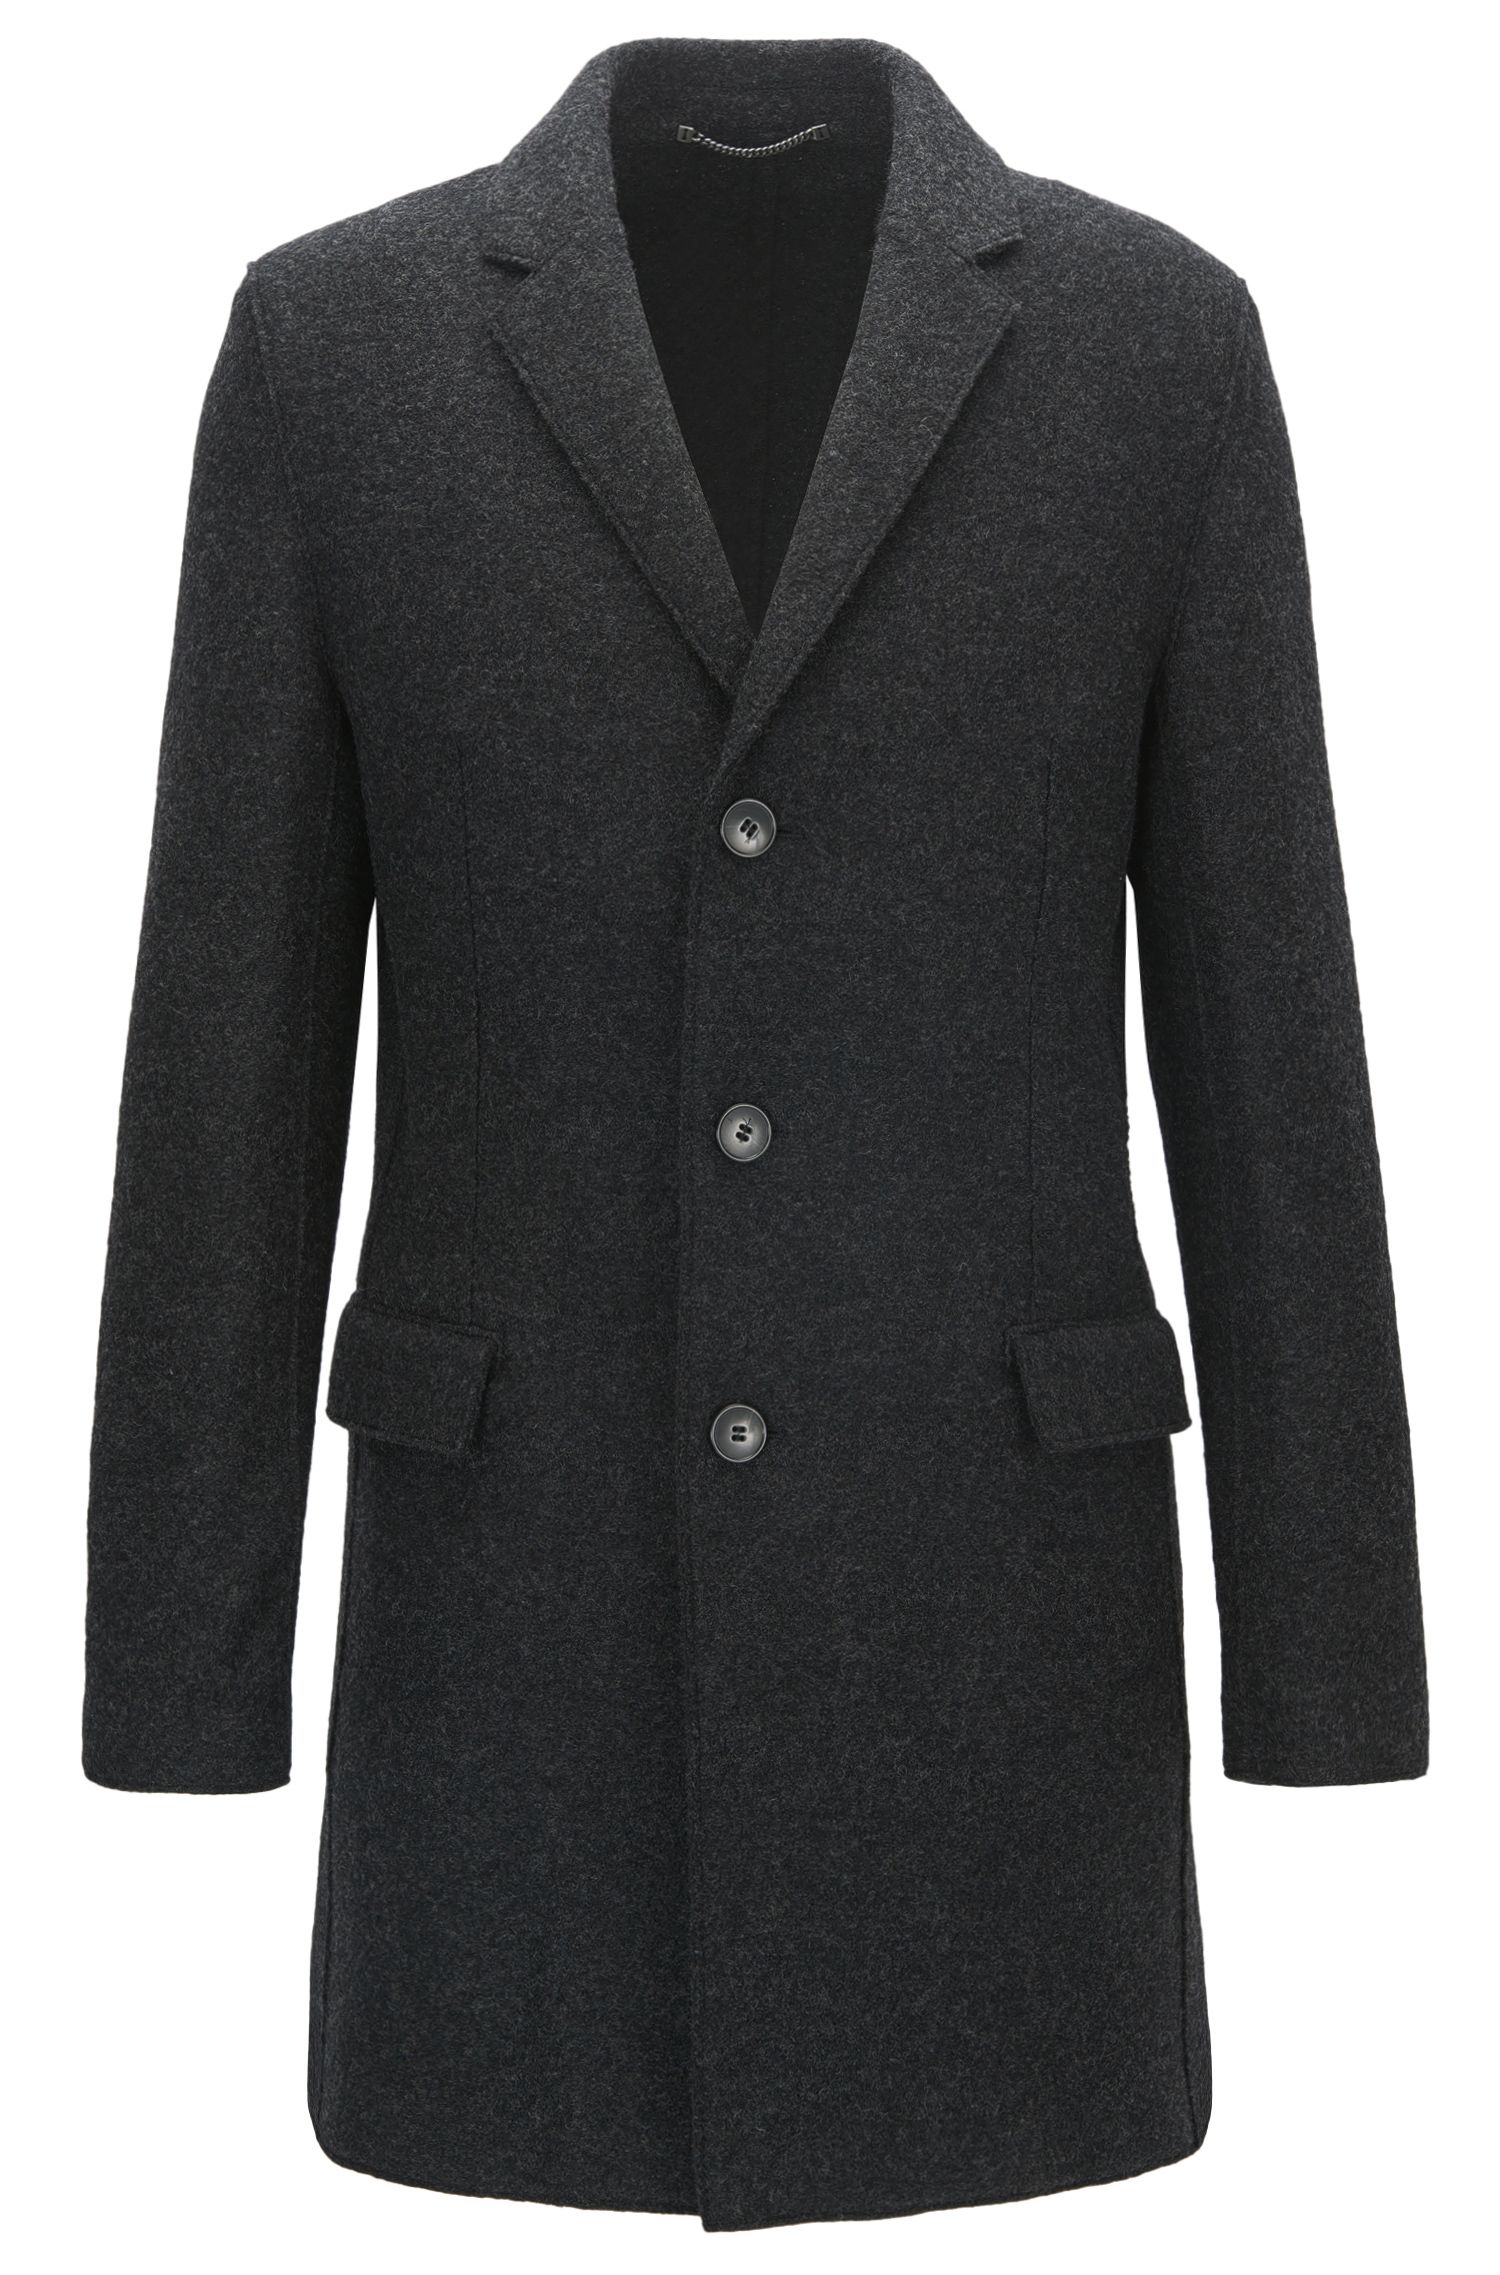 Melange slim-fit virgin wool coat with notch lapels